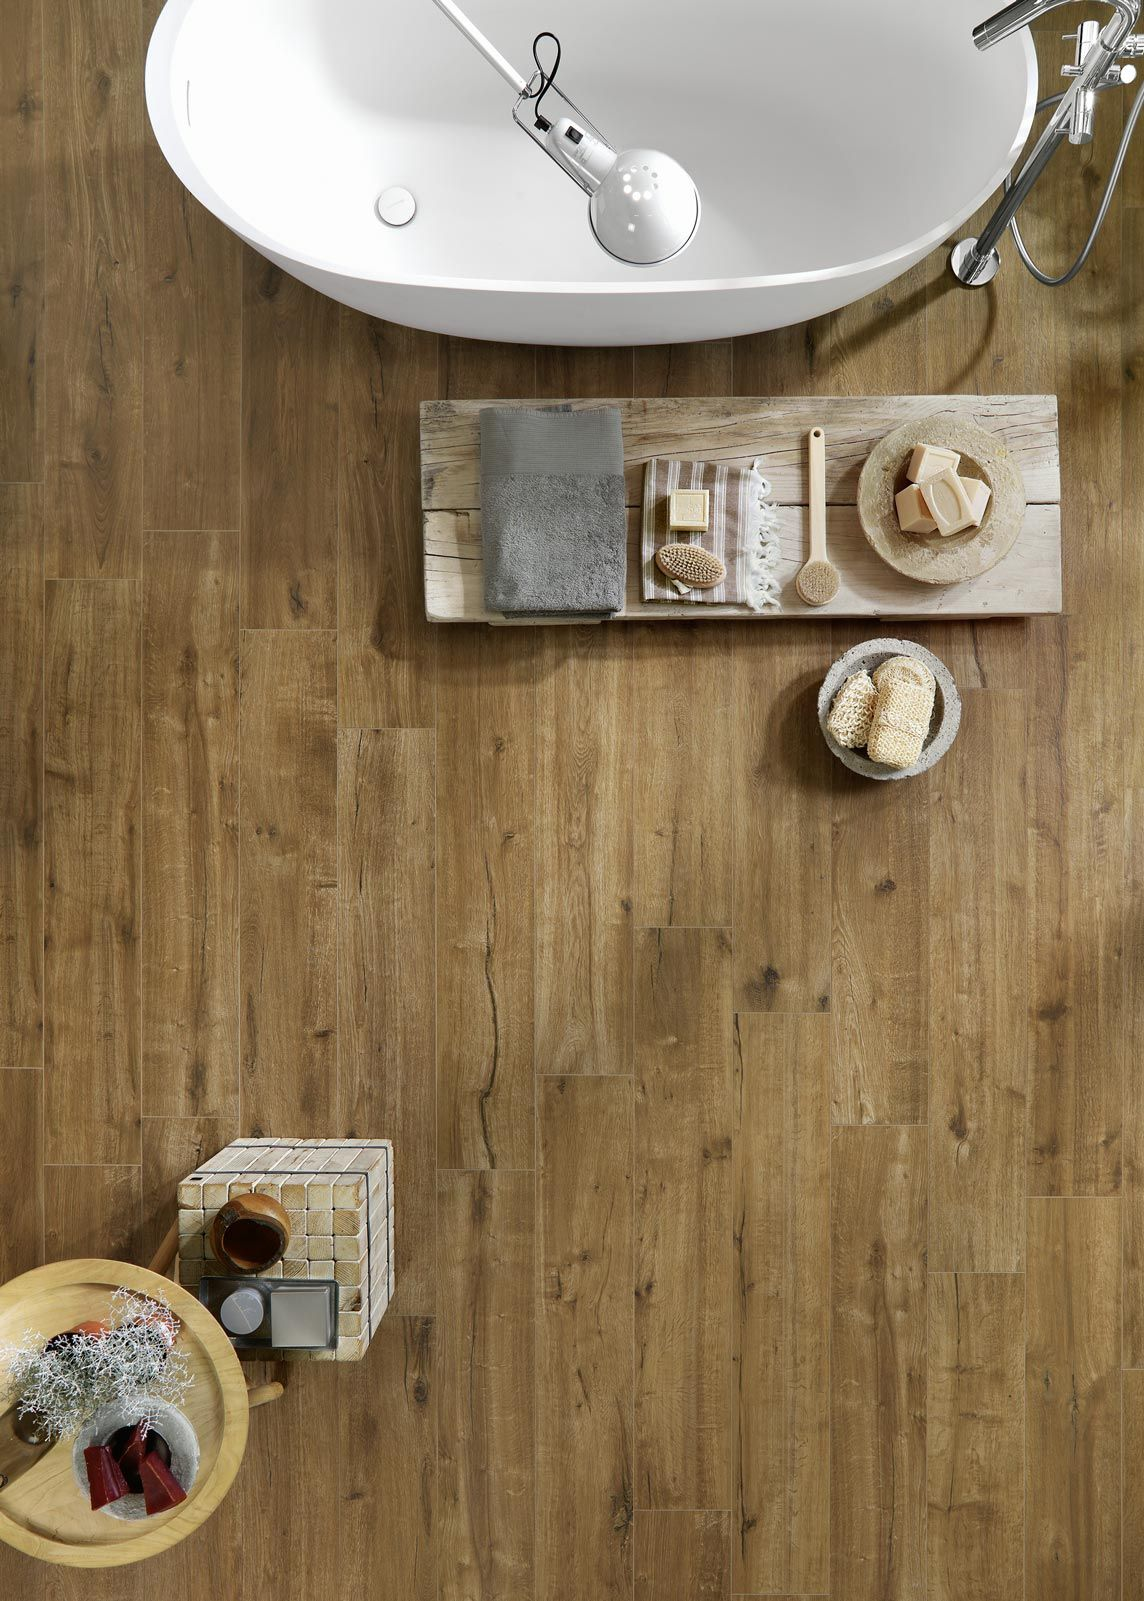 Woodtale ceramic tiles ragno6861 dado pinterest woodtale ceramic tiles ragno6861 doublecrazyfo Gallery